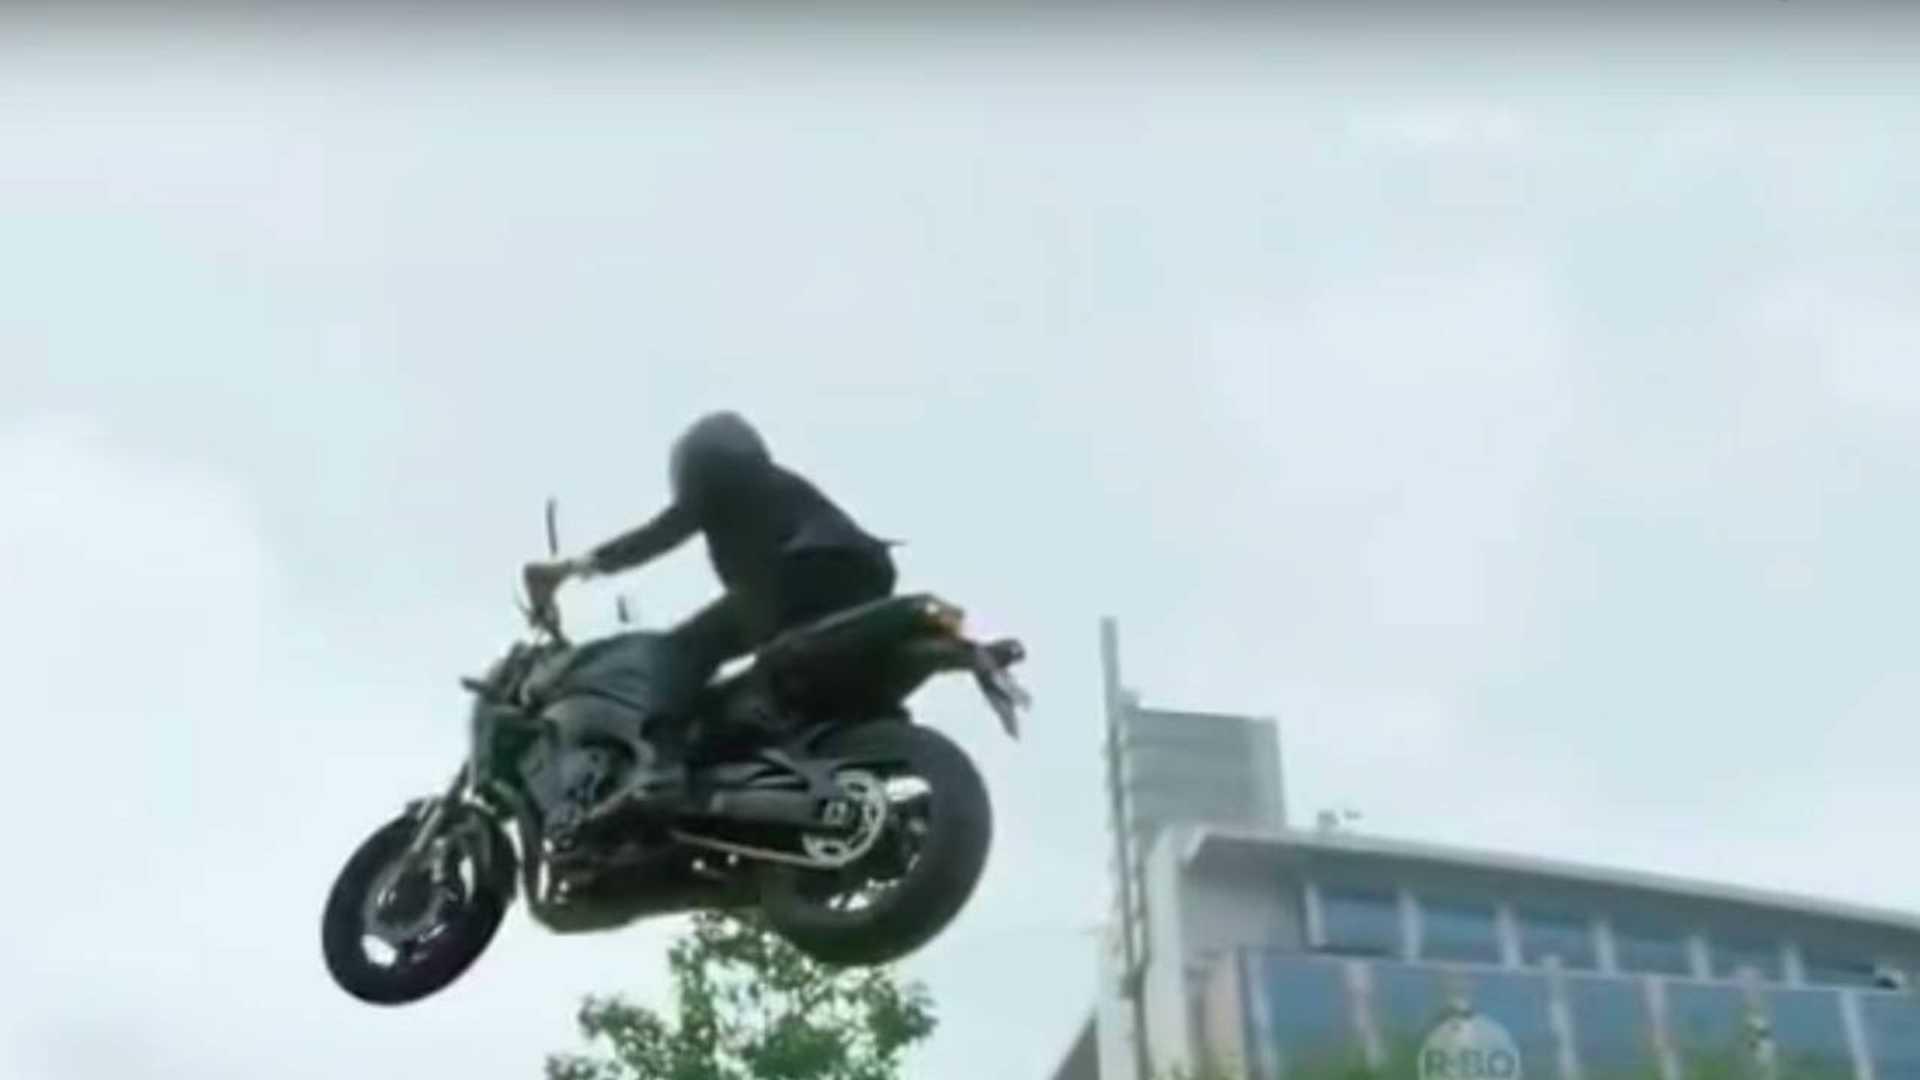 watch indonesia s president show off his sick bike skills